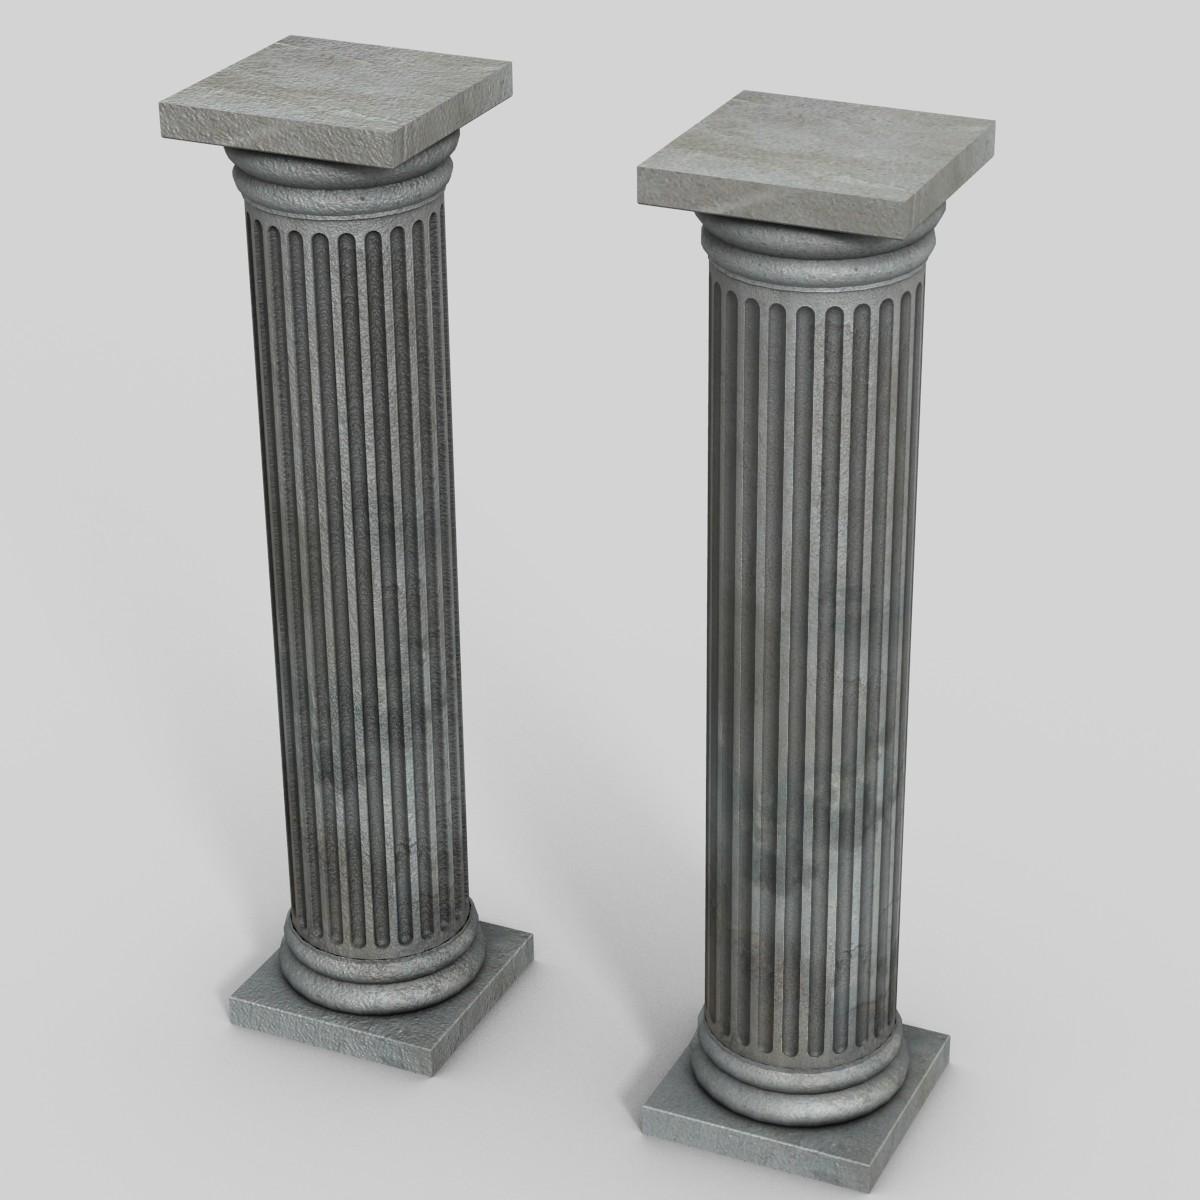 Digital 3D Assets - Rocz3D Studio